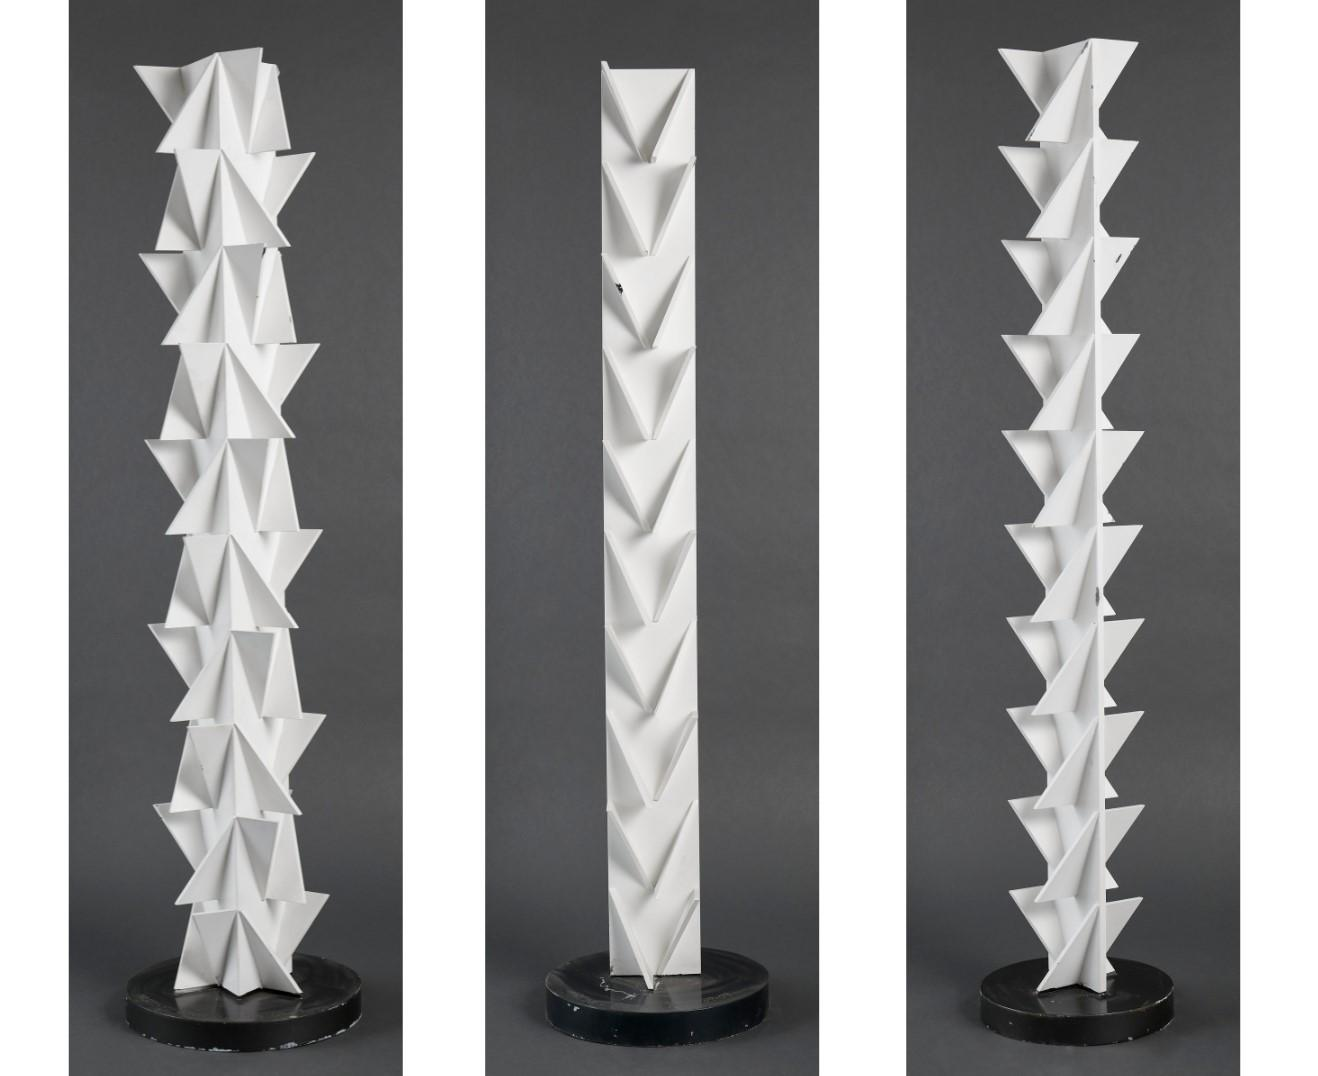 Lote 038 – 3 esculturas de aço e esmalte branco